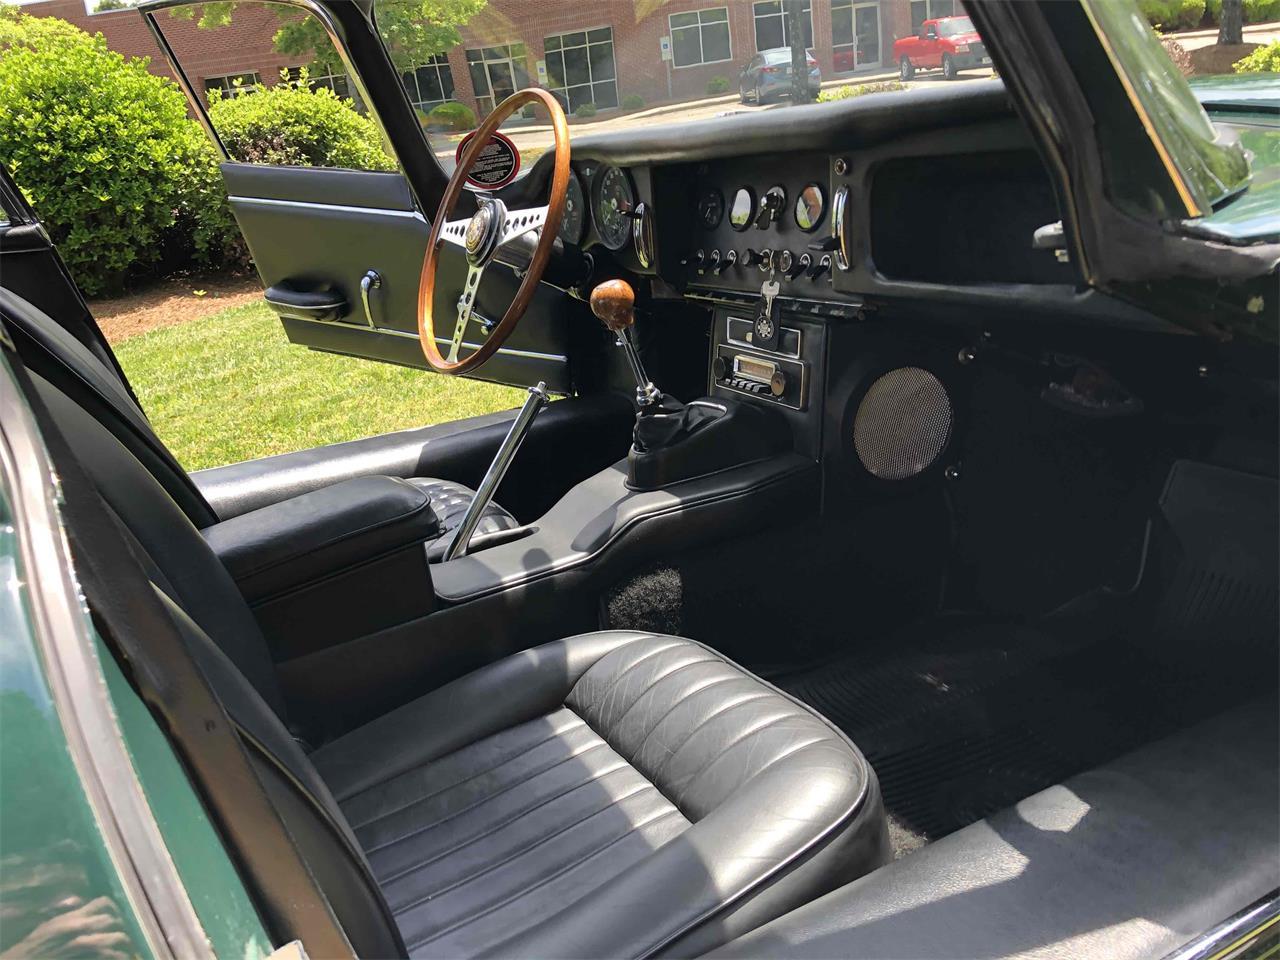 1968 Jaguar E-Type (CC-1353314) for sale in Morrisville, North Carolina